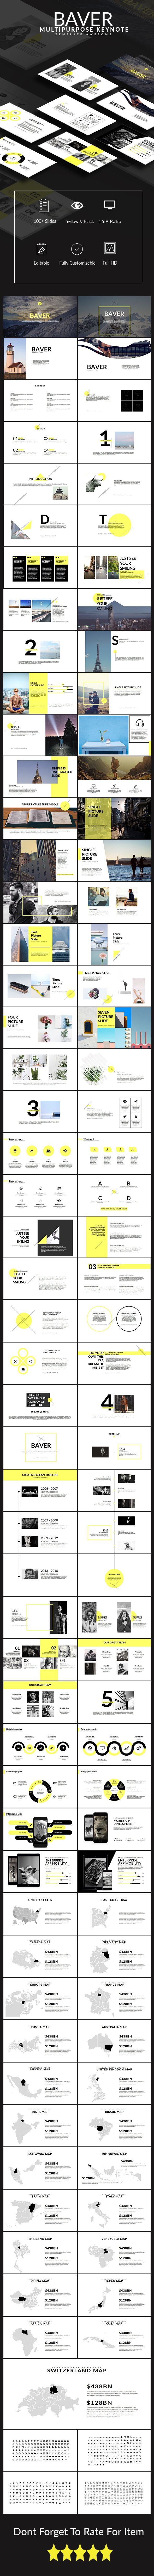 Baver Multipurpose Keynote Presentation Template